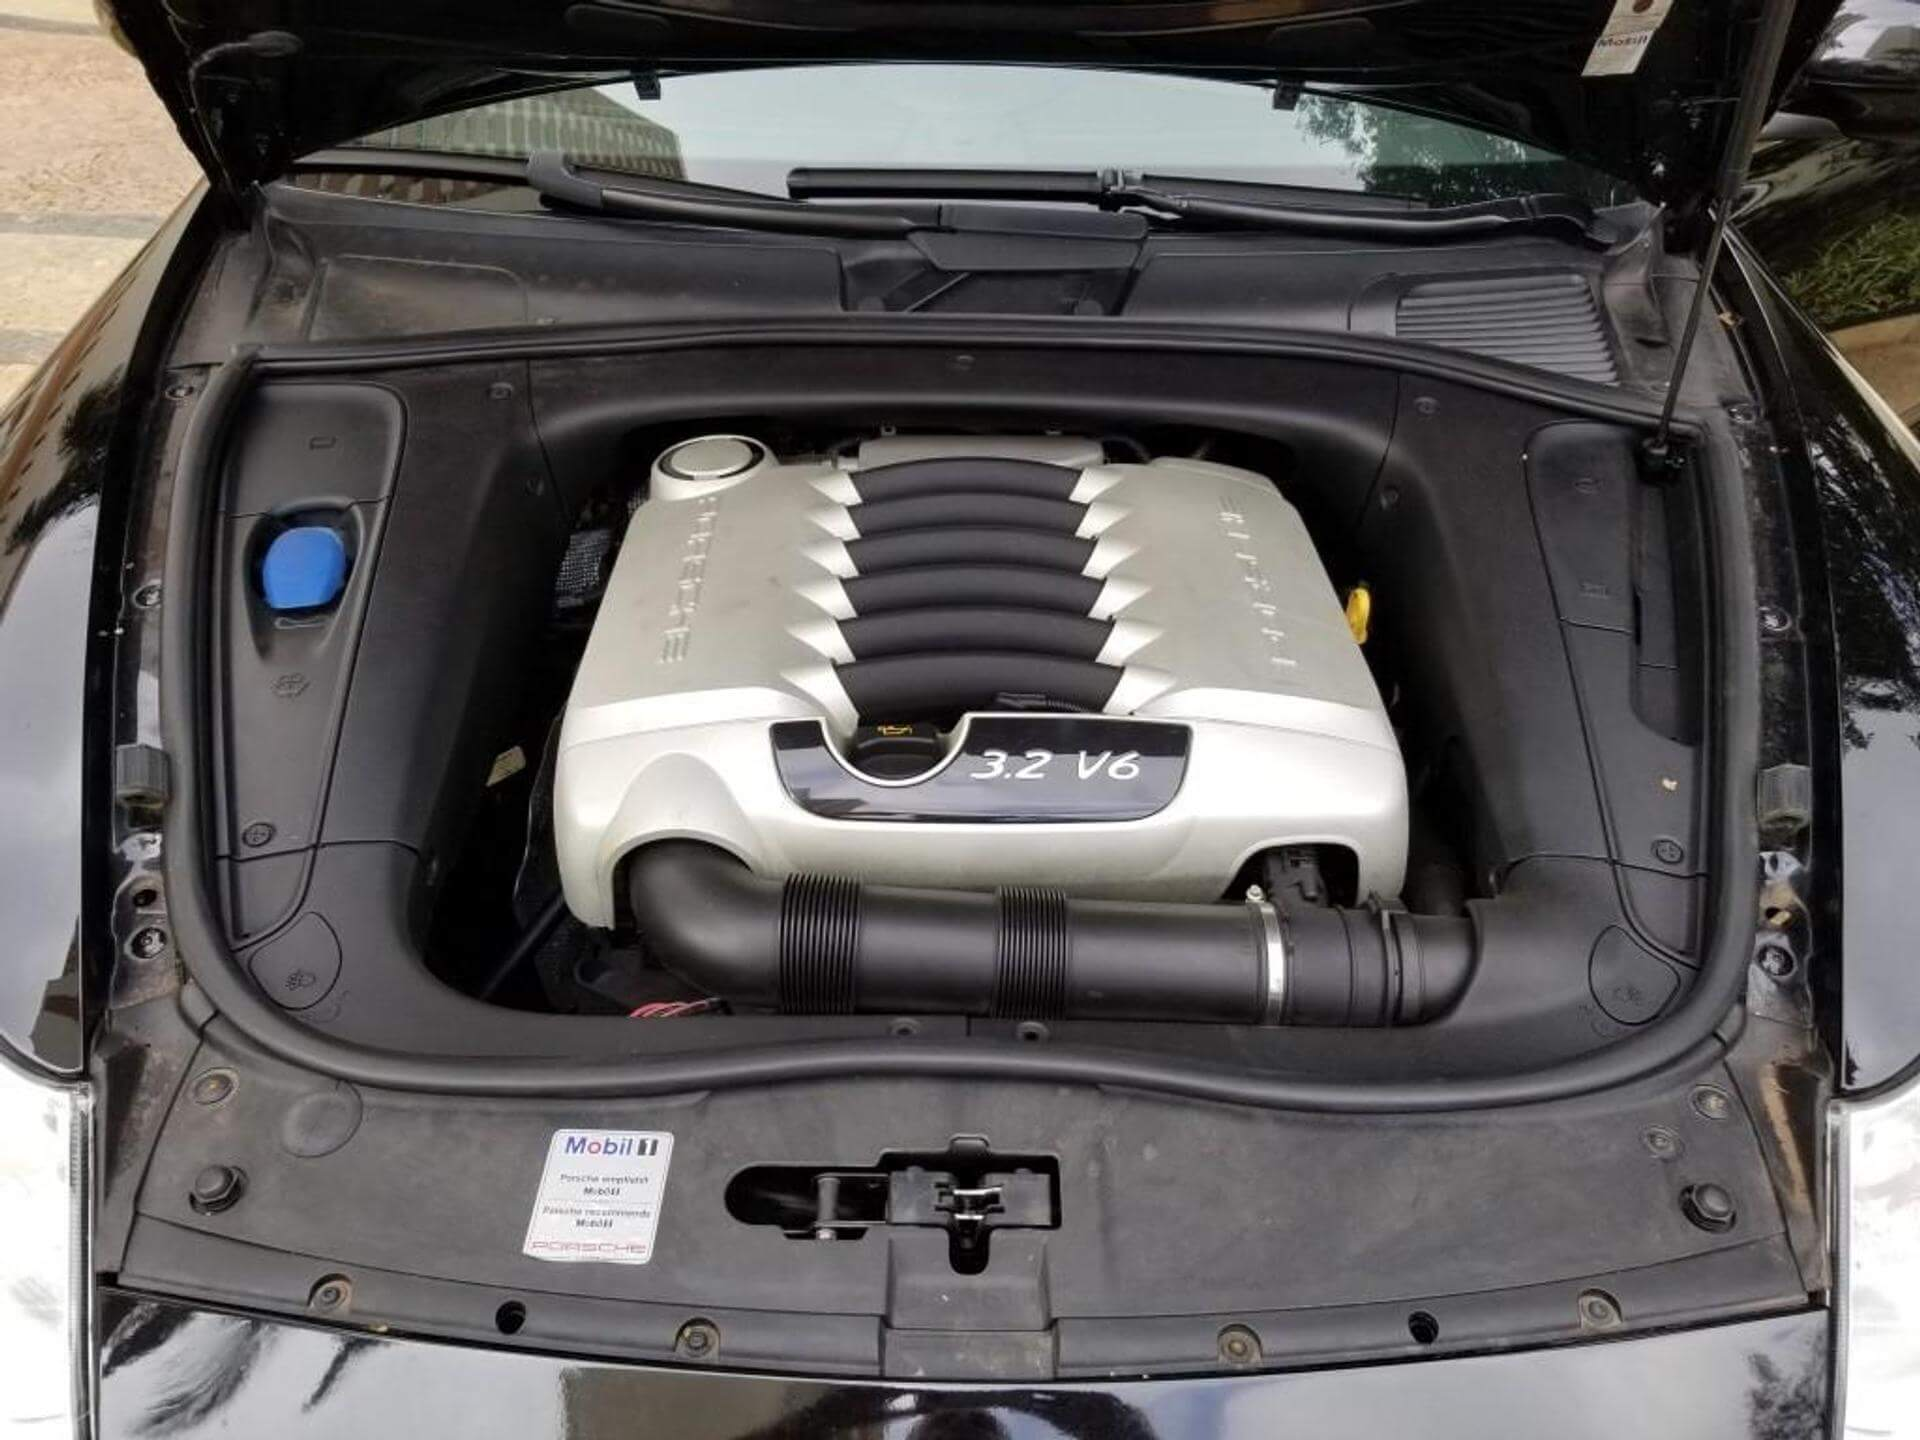 Porsche Cayenne 3.2 4x4 V6 24v Gasolina 4p Tiptronic Wmimagem18173171022